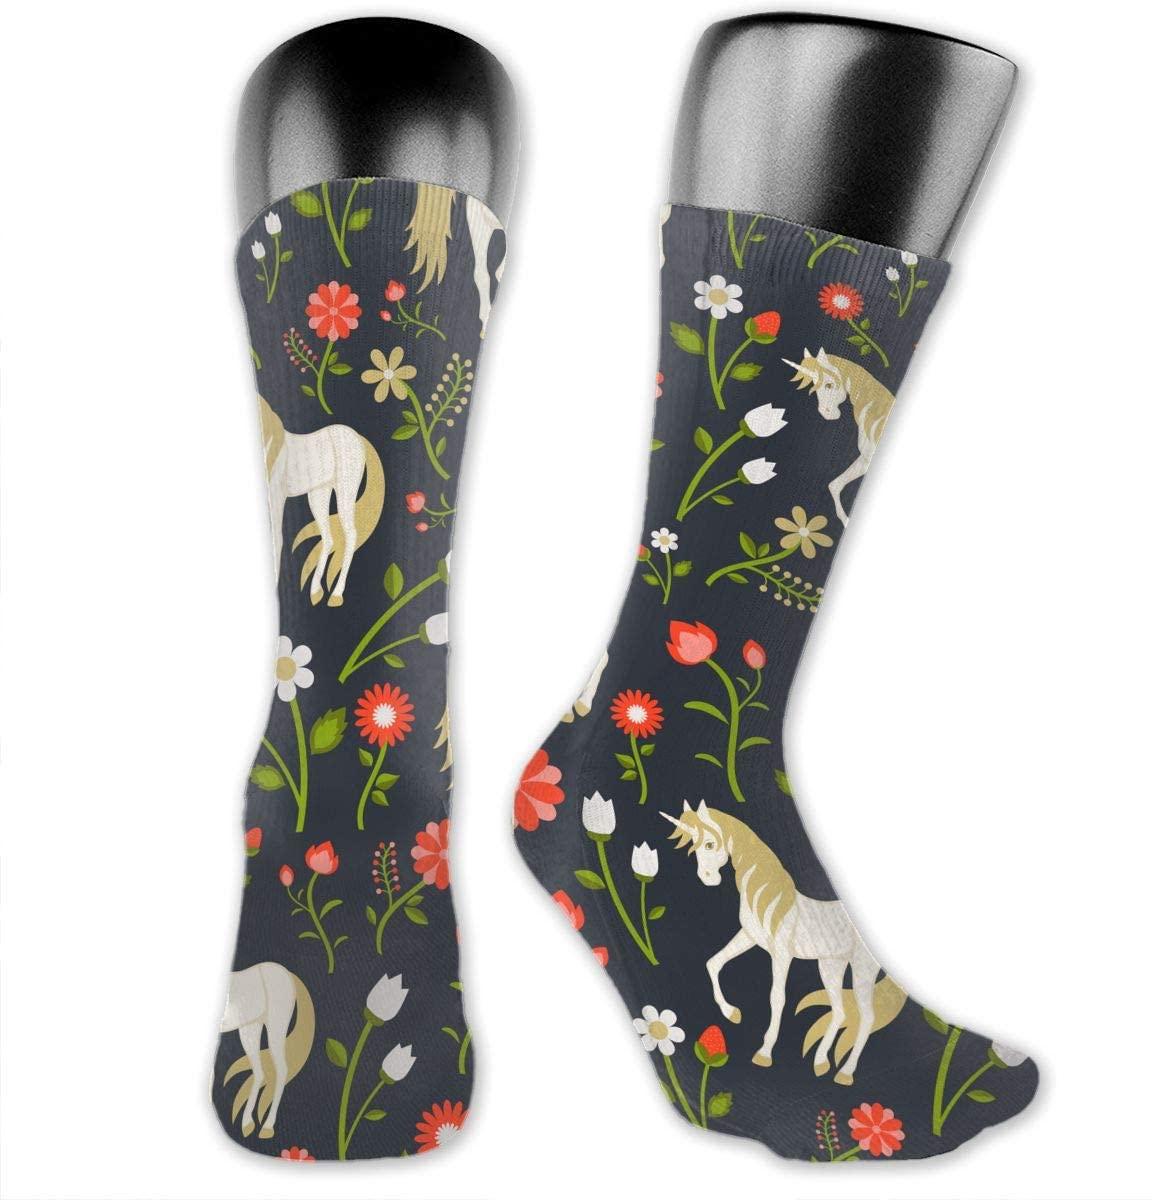 Unicorn Flowers (2) Unisex Outdoor Long Socks Sport Athletic Crew Socks Stockings